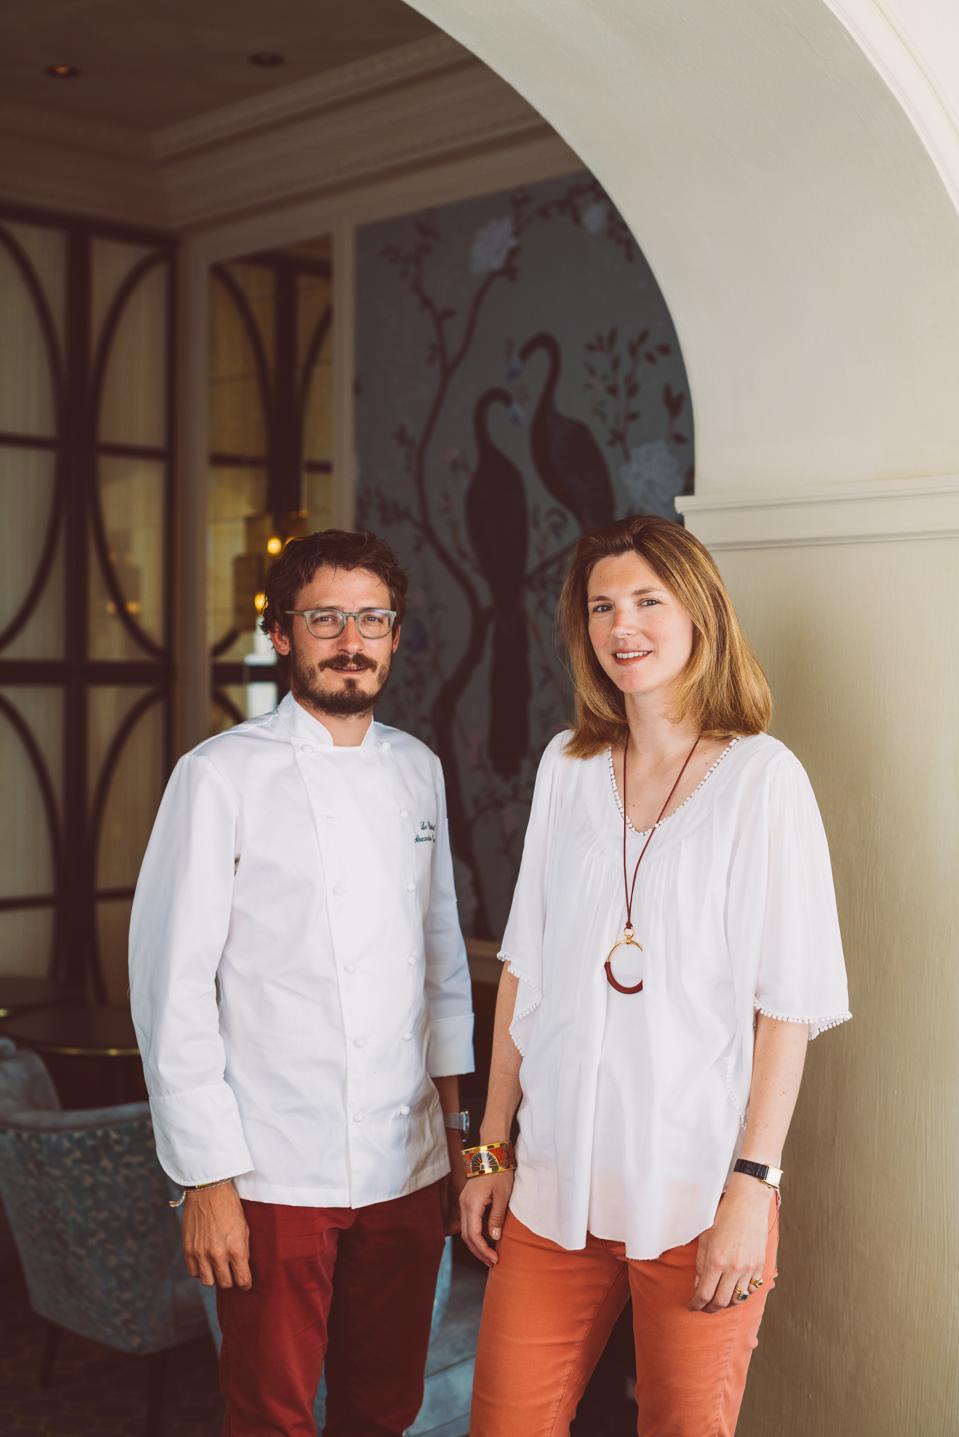 Owner Stéphanie de Boüard-Rivoal and Chef Alexandre Baumard